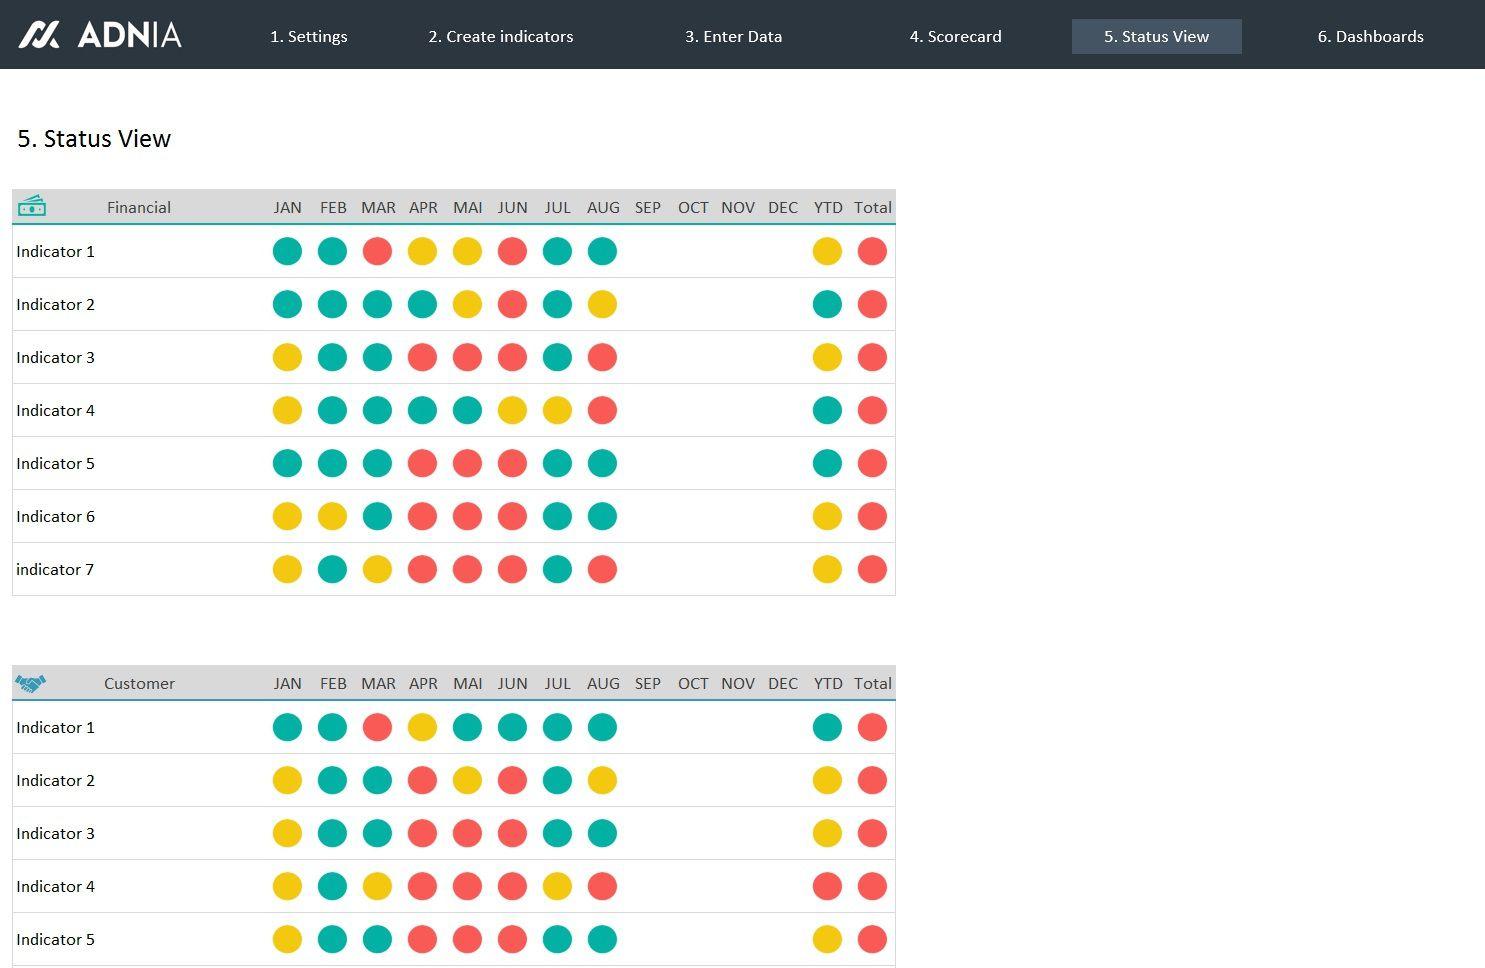 001 Surprising Balanced Scorecard Excel Template Highest Quality  Dashboard Download HrFull